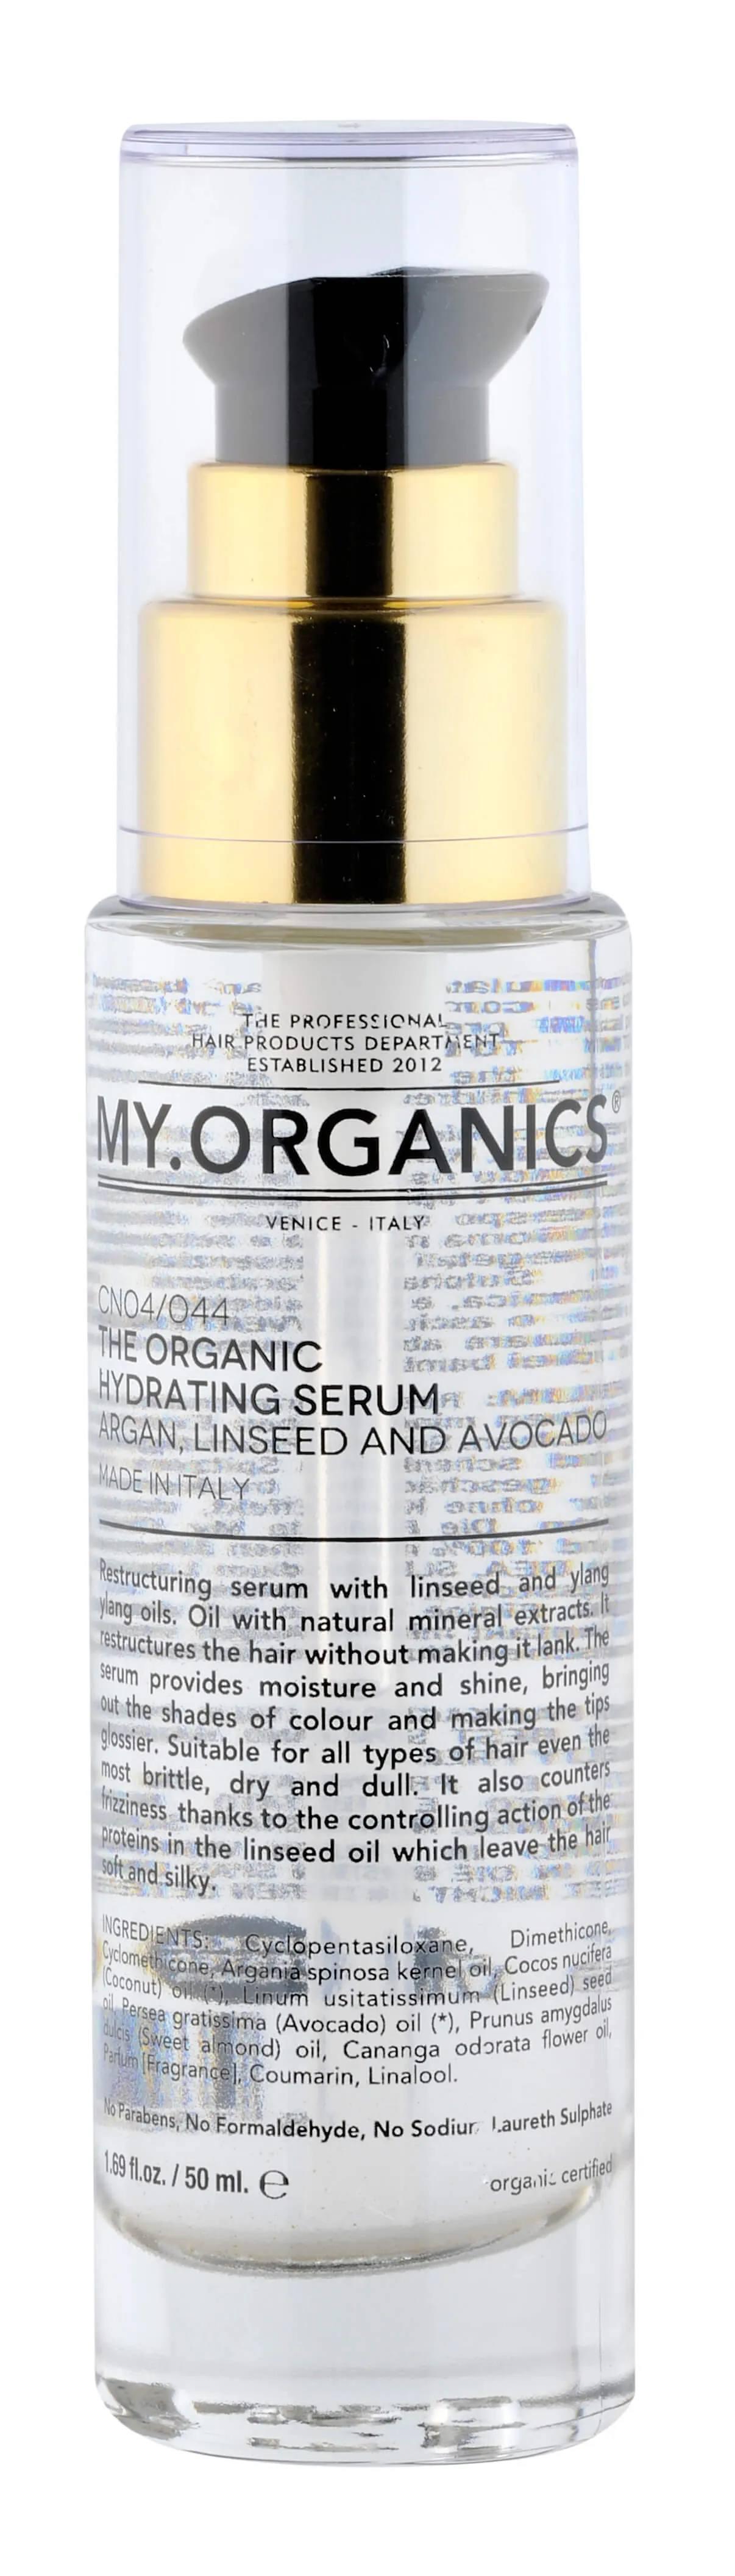 CABELLO - The Organic Hydrating Serum 50ml